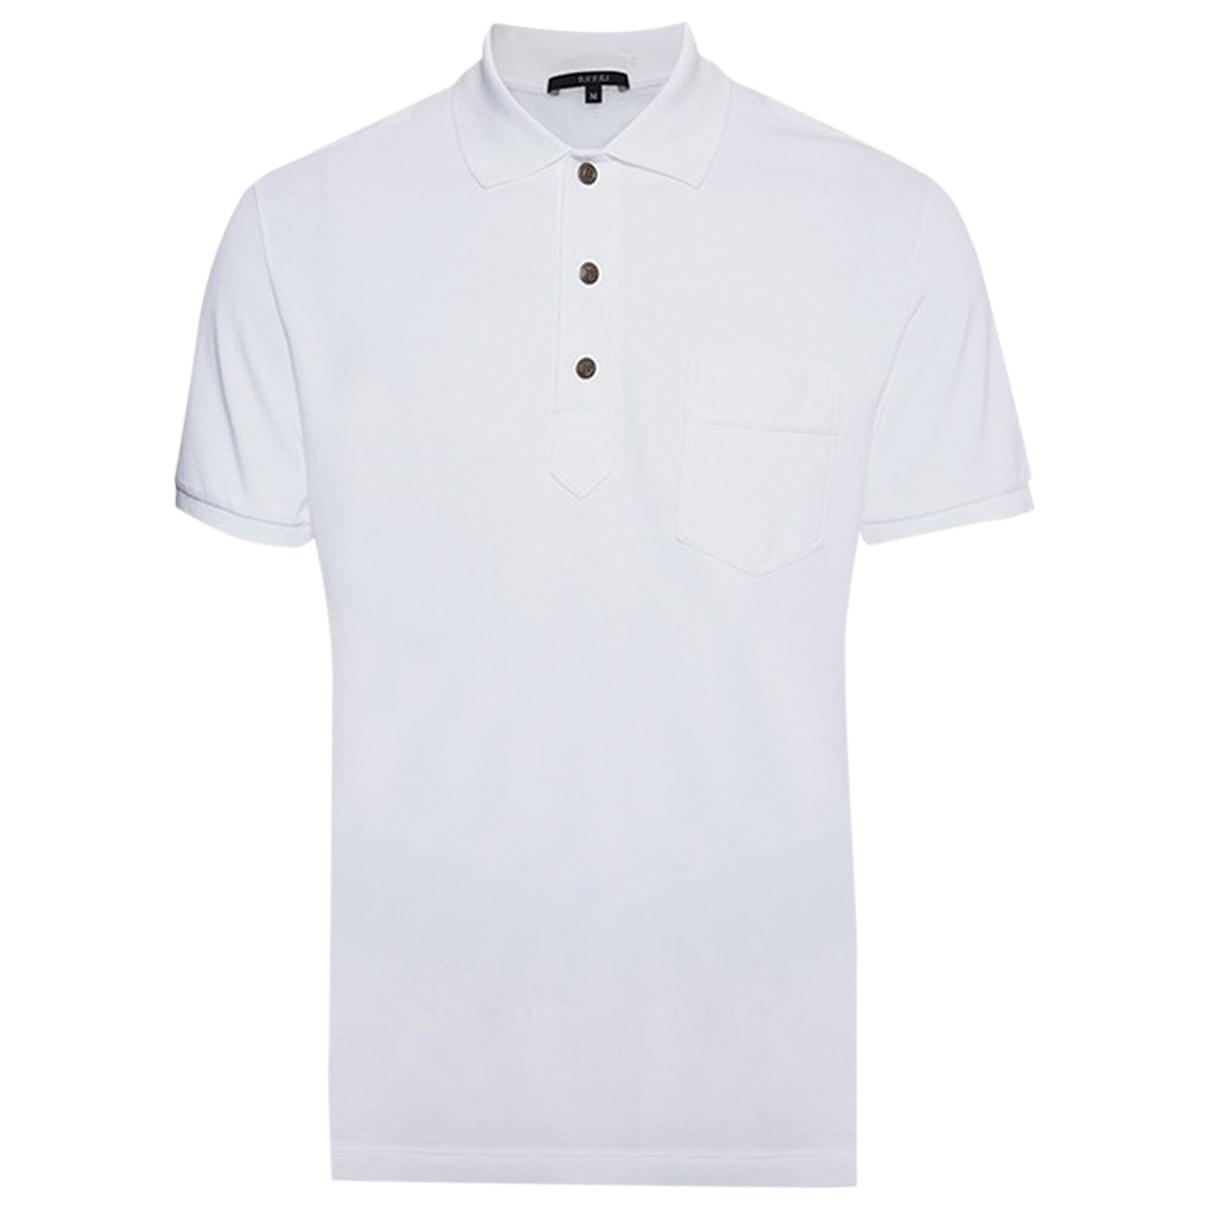 Gucci \N White Cotton Polo shirts for Men S International